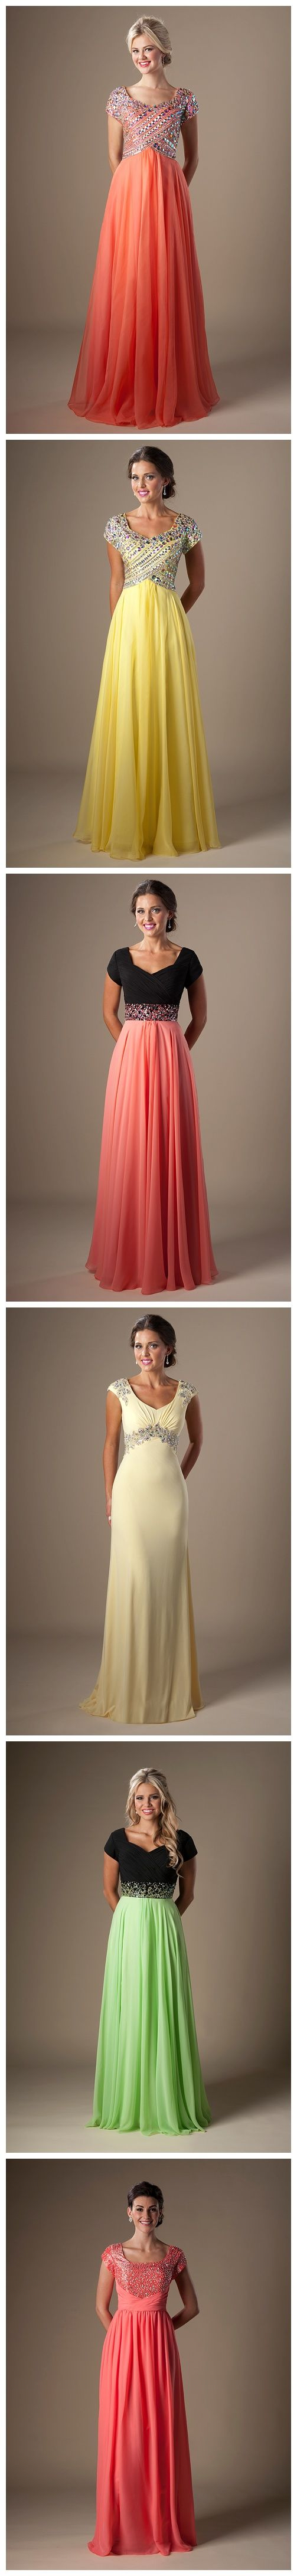 Modest prom dresses. Pastel prom dresses. Prom fashion. Prom 2015. Prom dress ideas.